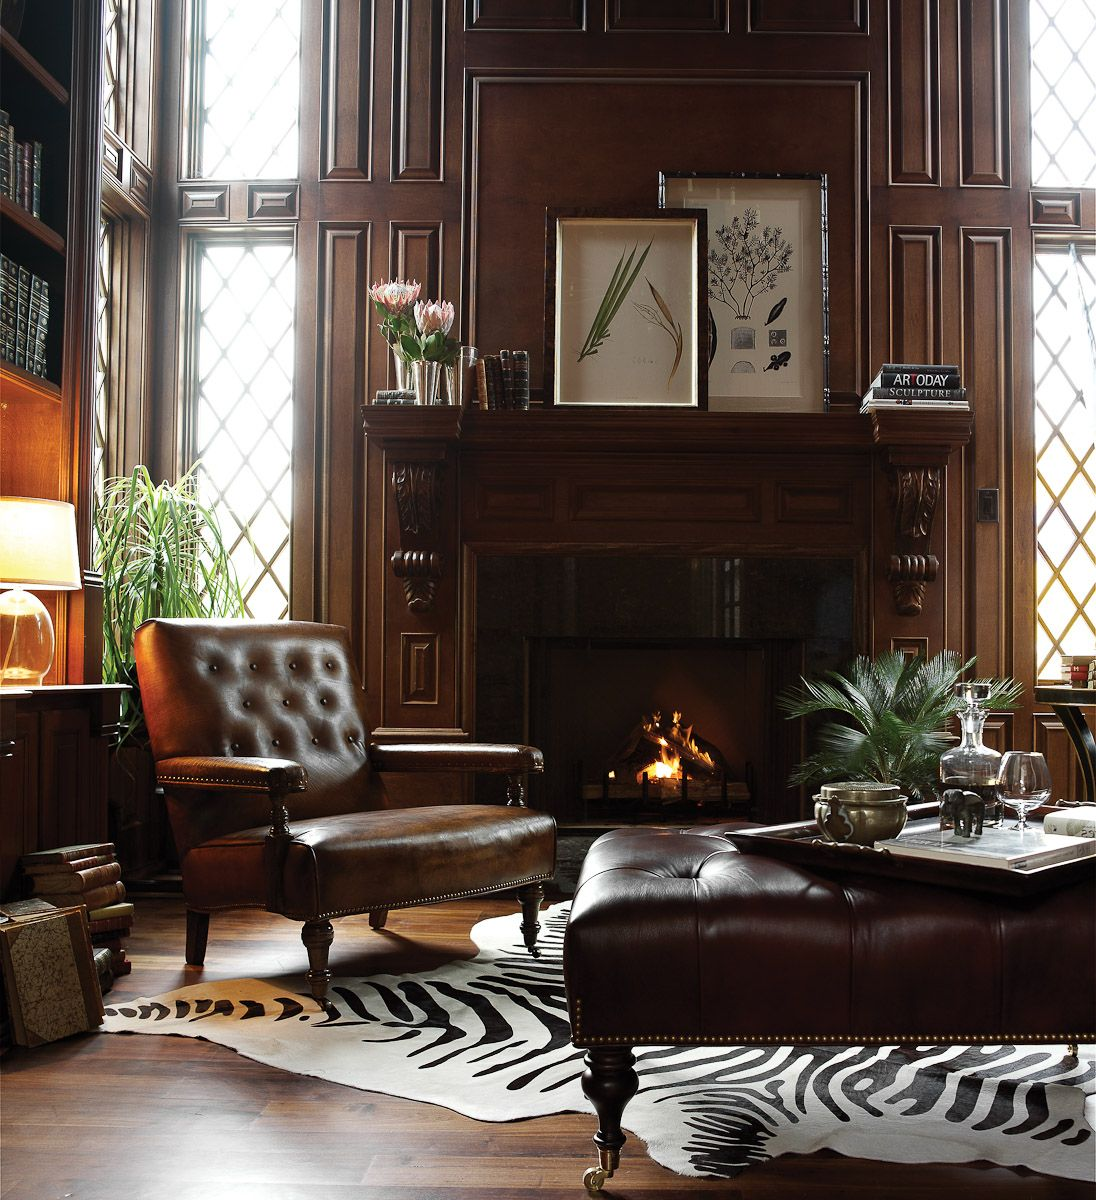 Living Room Leather Furniture Luxury Furniture Design Living Room Leather Bedroom Design